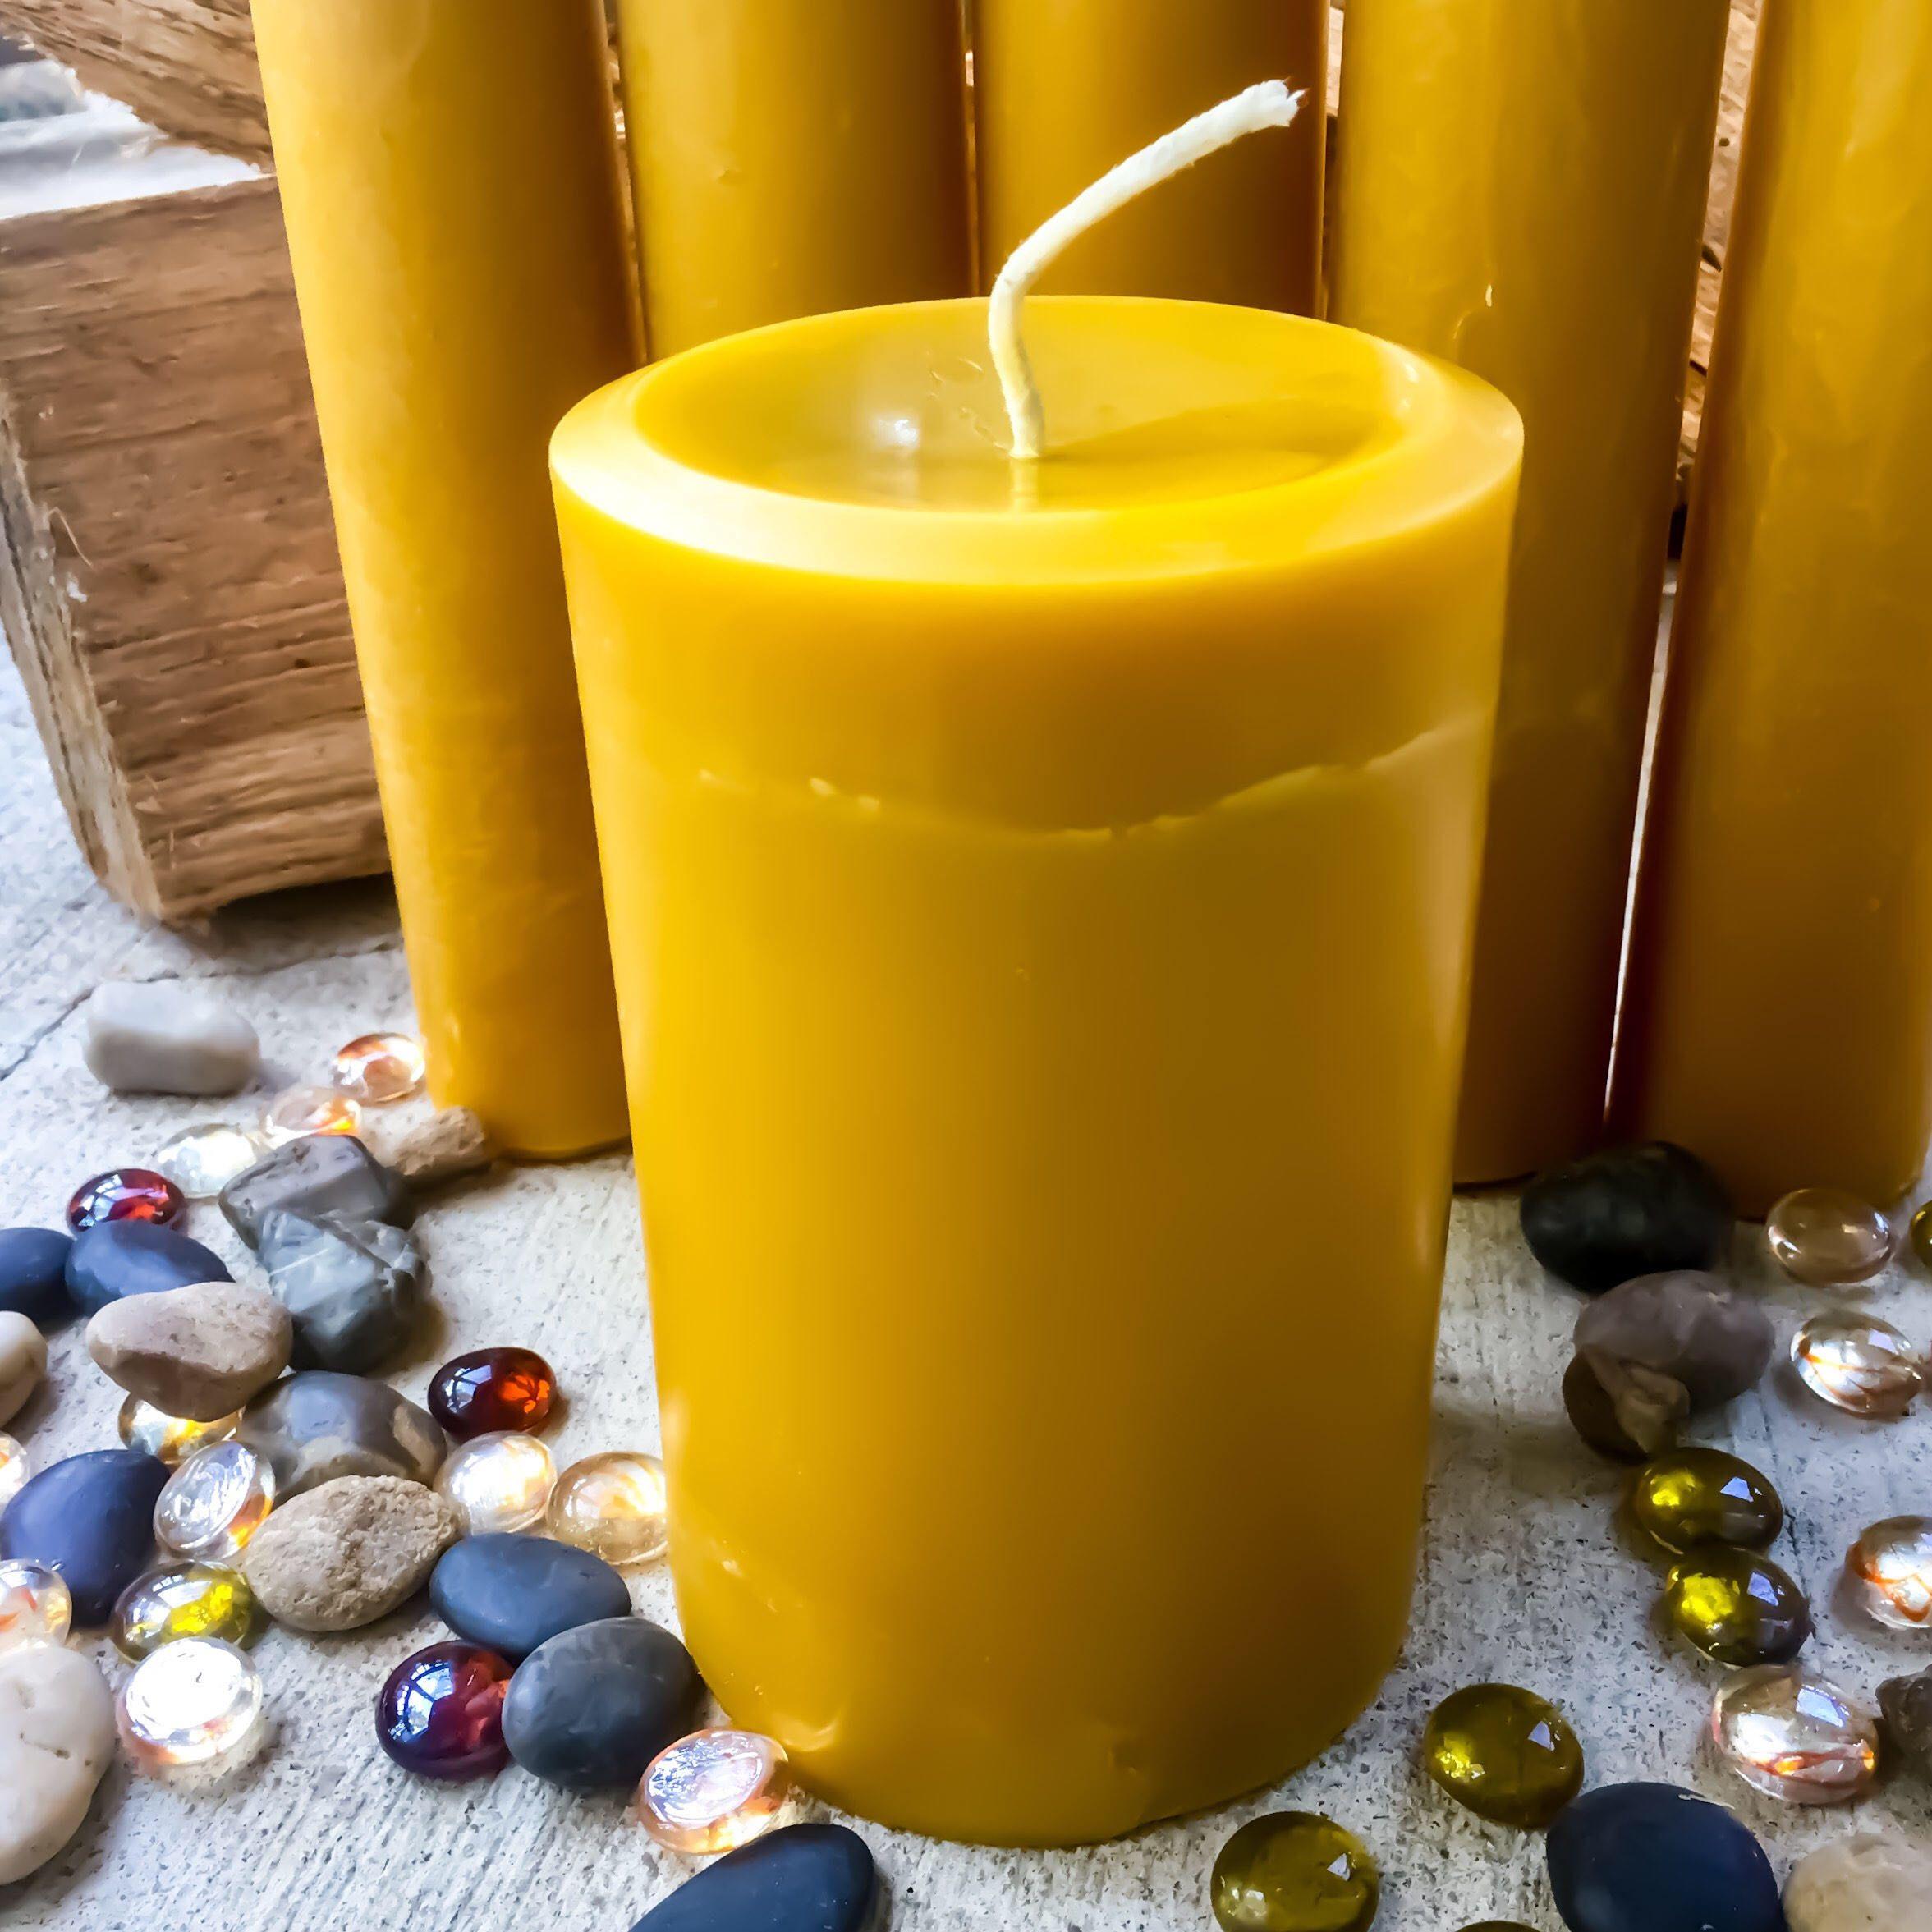 100/% beeswax pillars